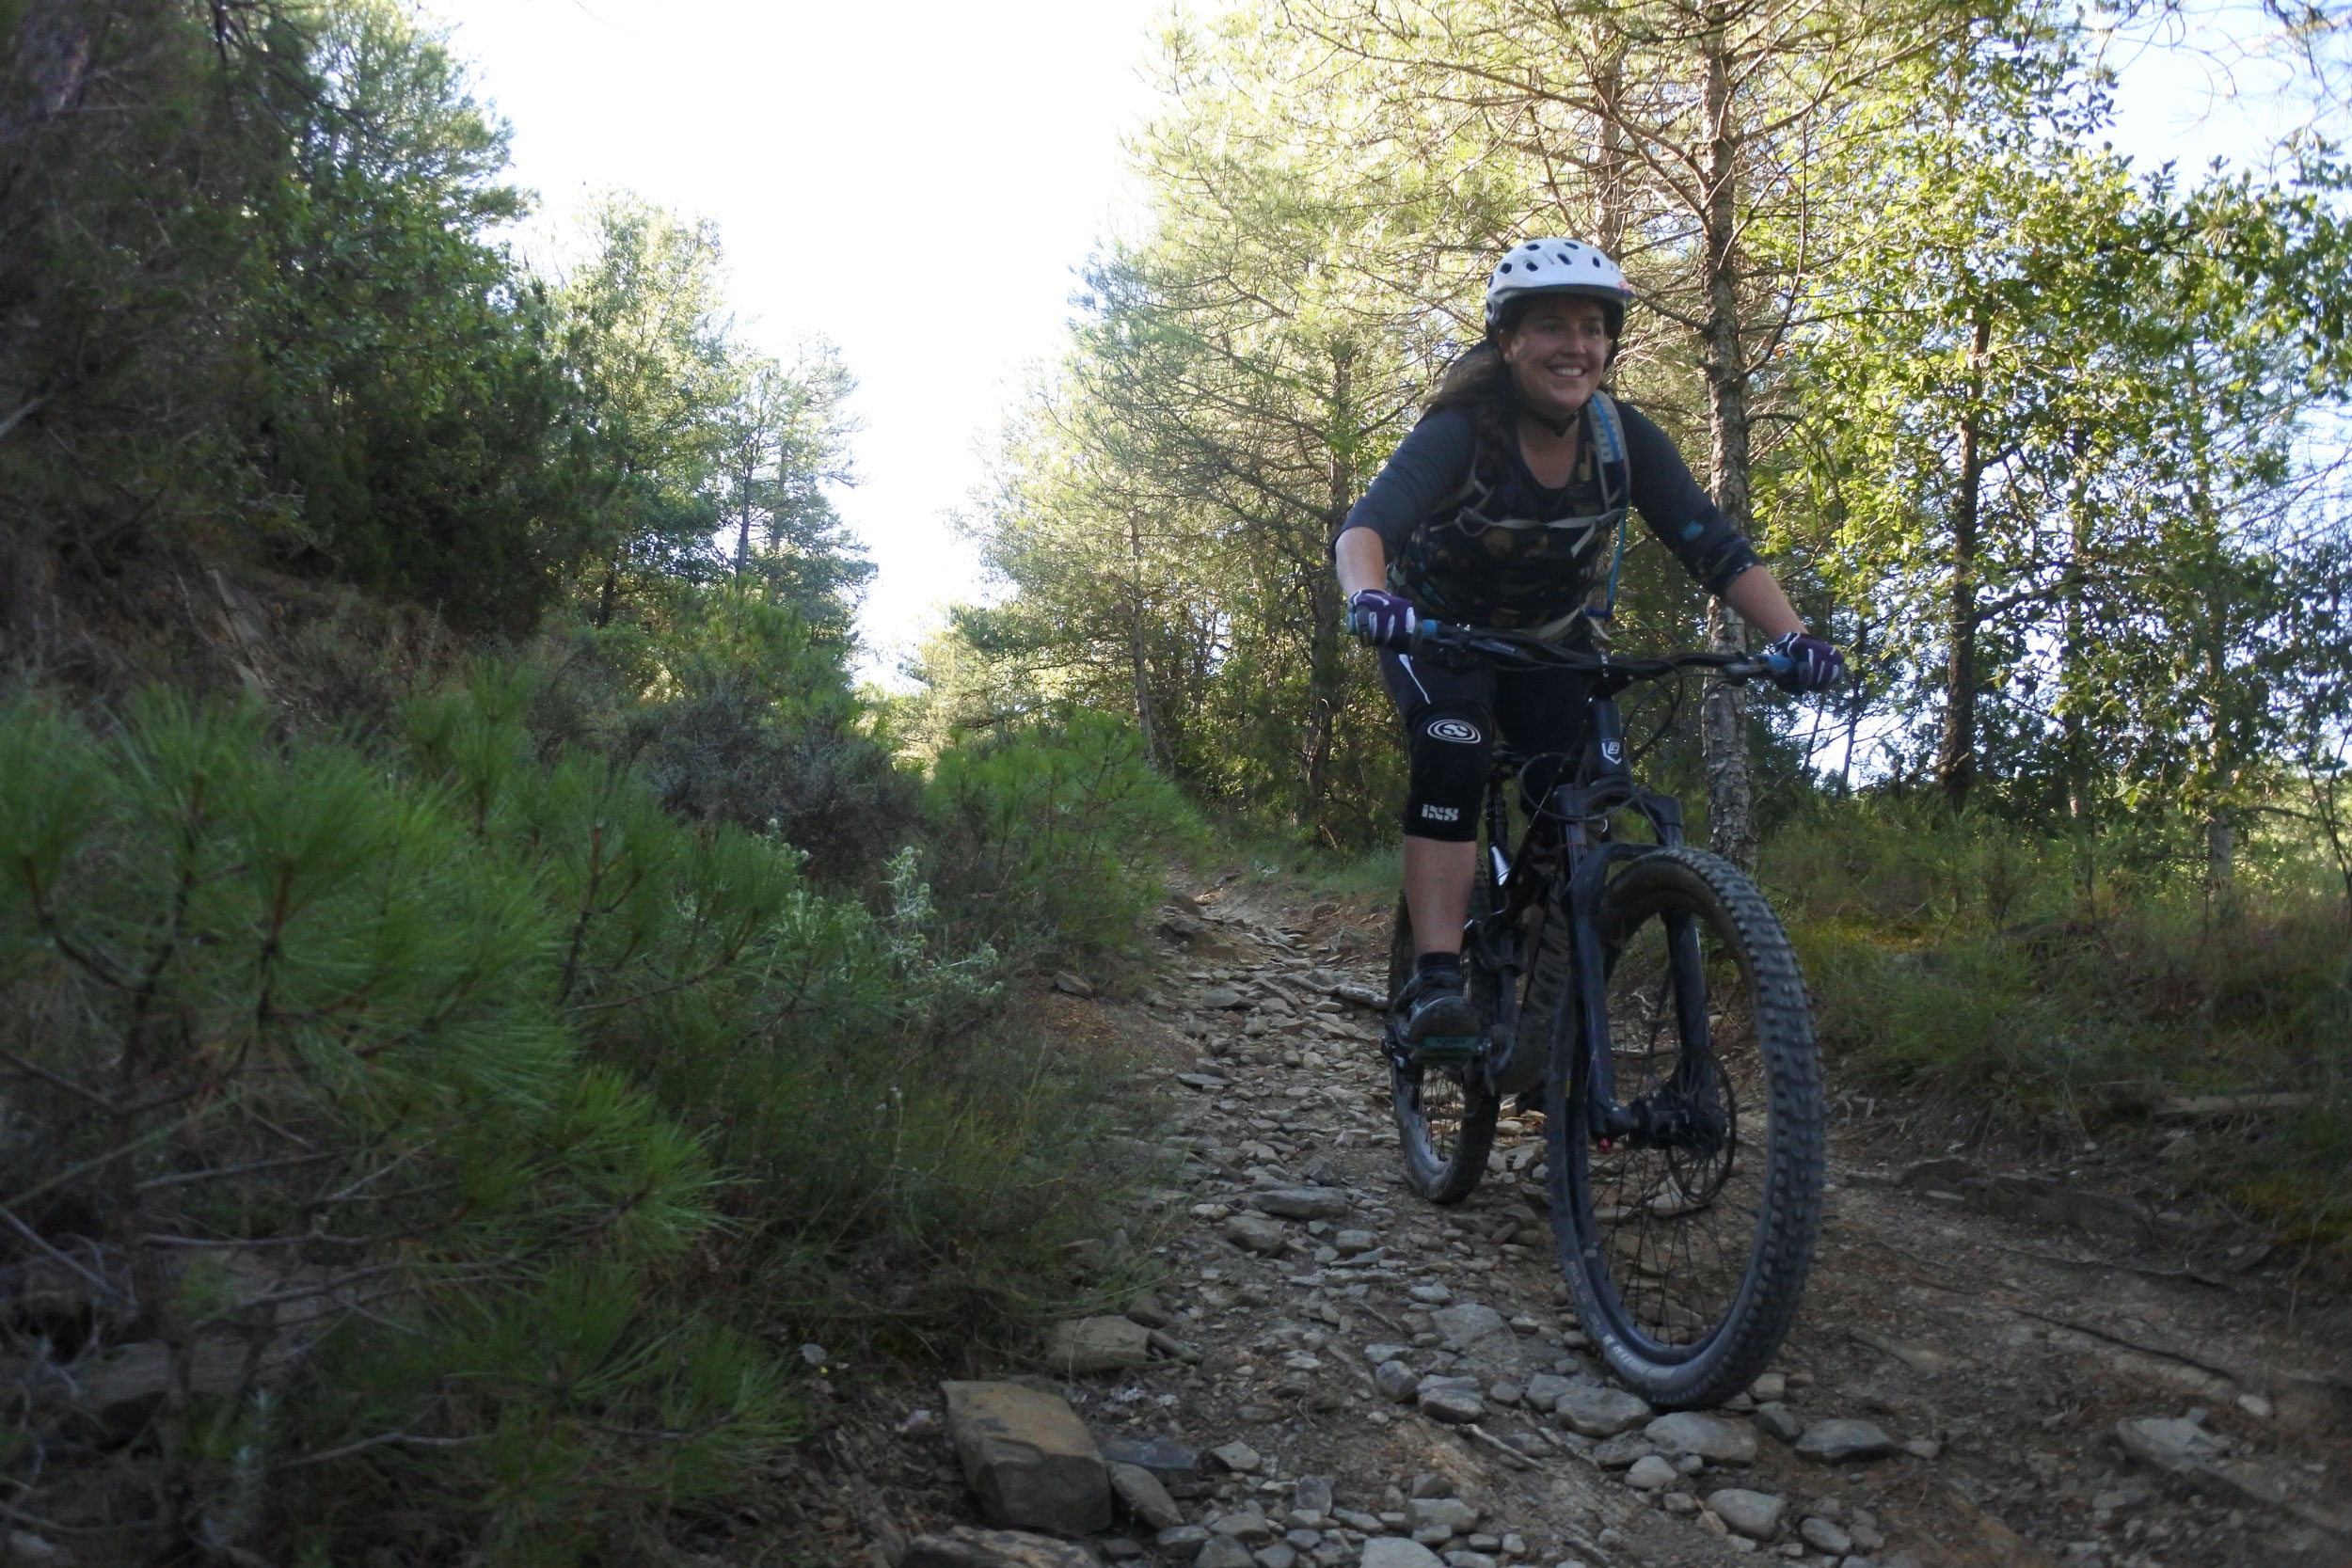 unbeaten-adventures-mountain-biking-pyrenees-zona-zero-ainsa-marce-bosque-de-banaston.jpg